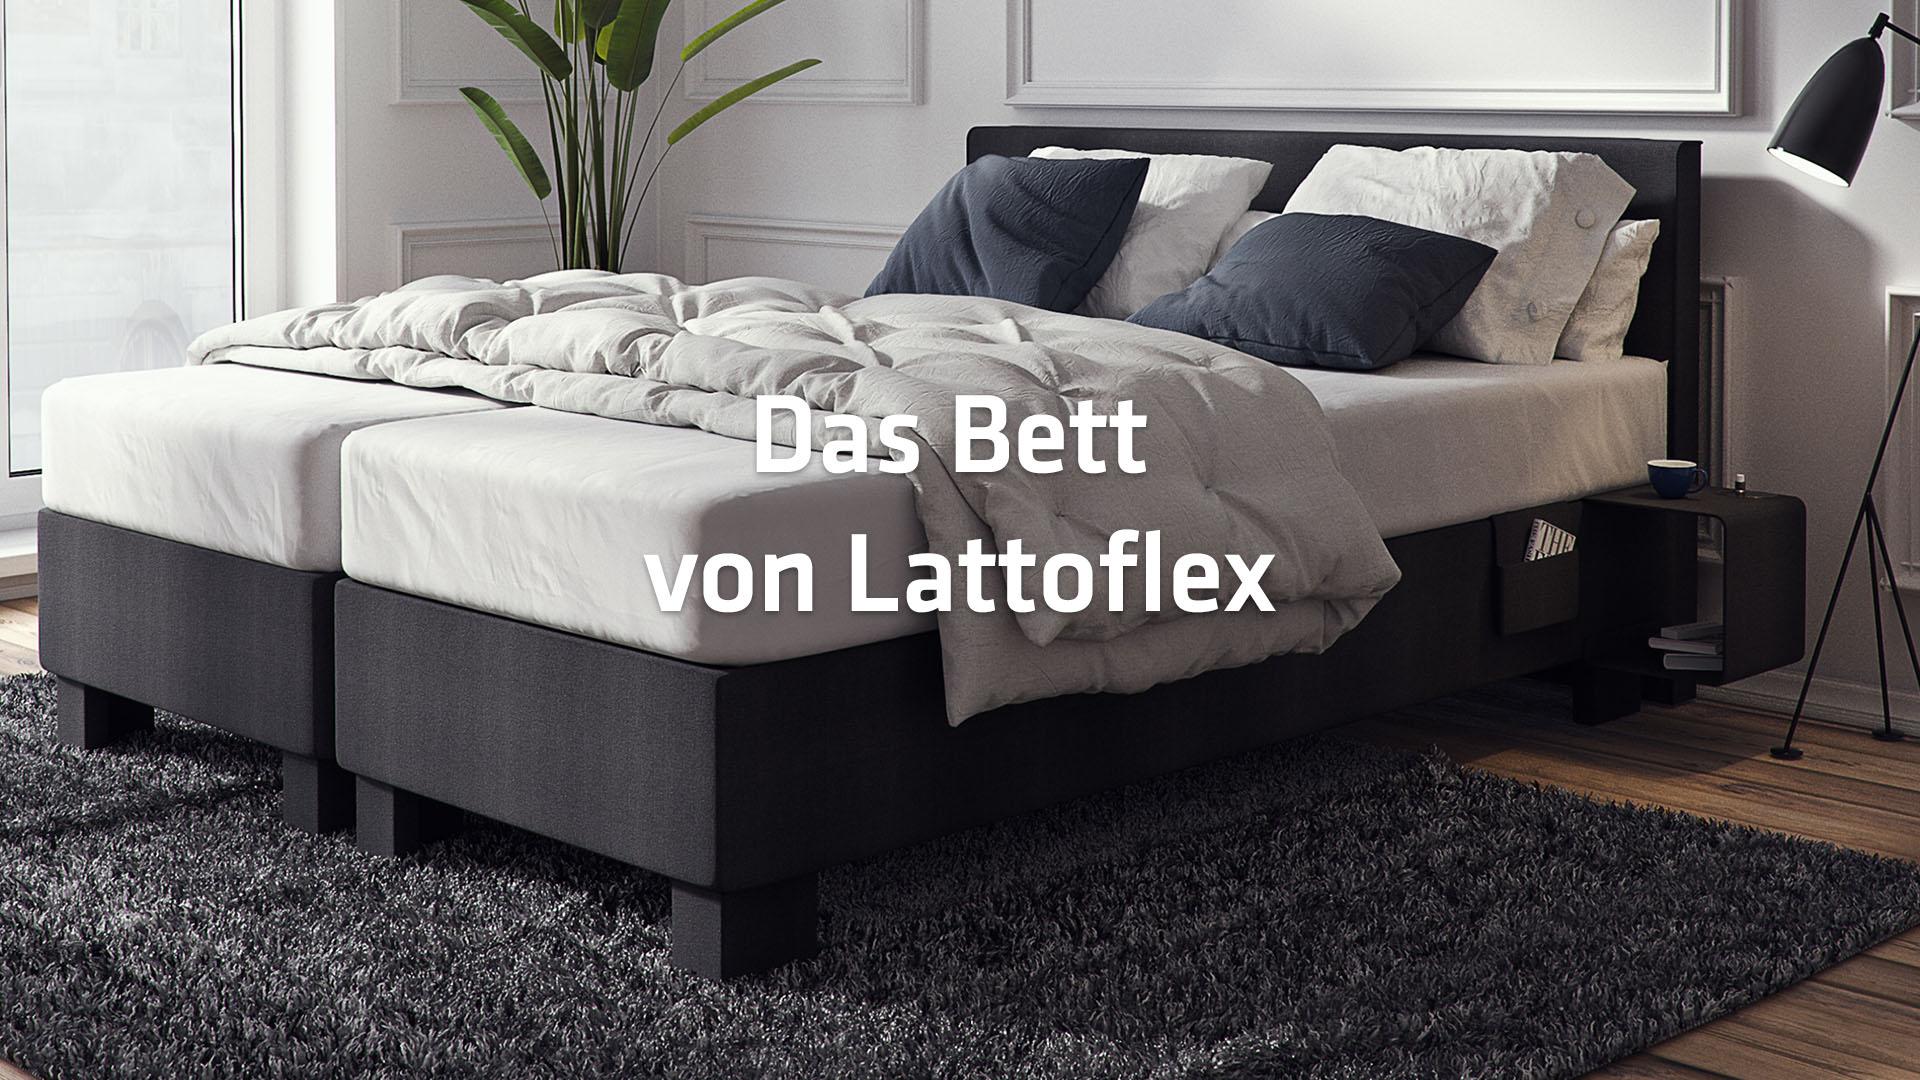 Lattoflex - Case Study